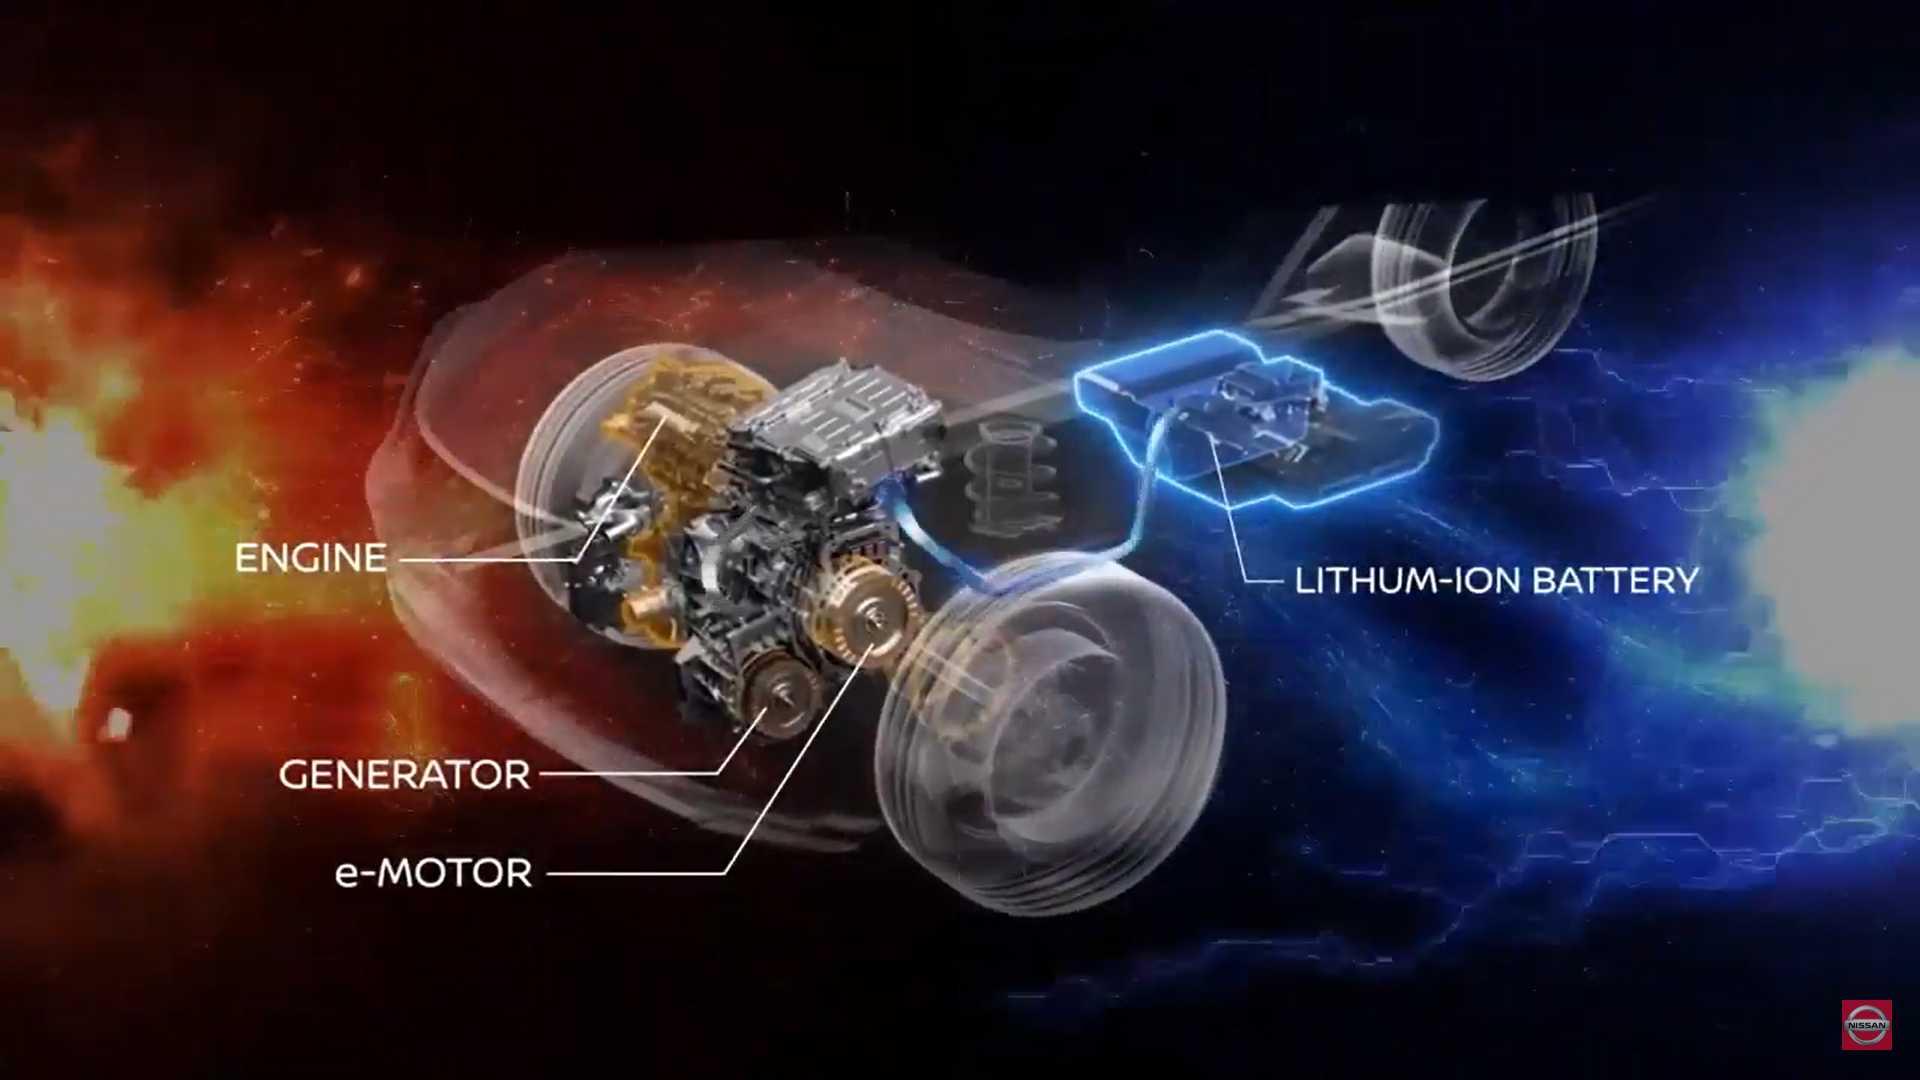 Basil van Rooyen表示這顆新型的二行程引擎能成為發電機、船用外引擎或增程電動車的動力來源